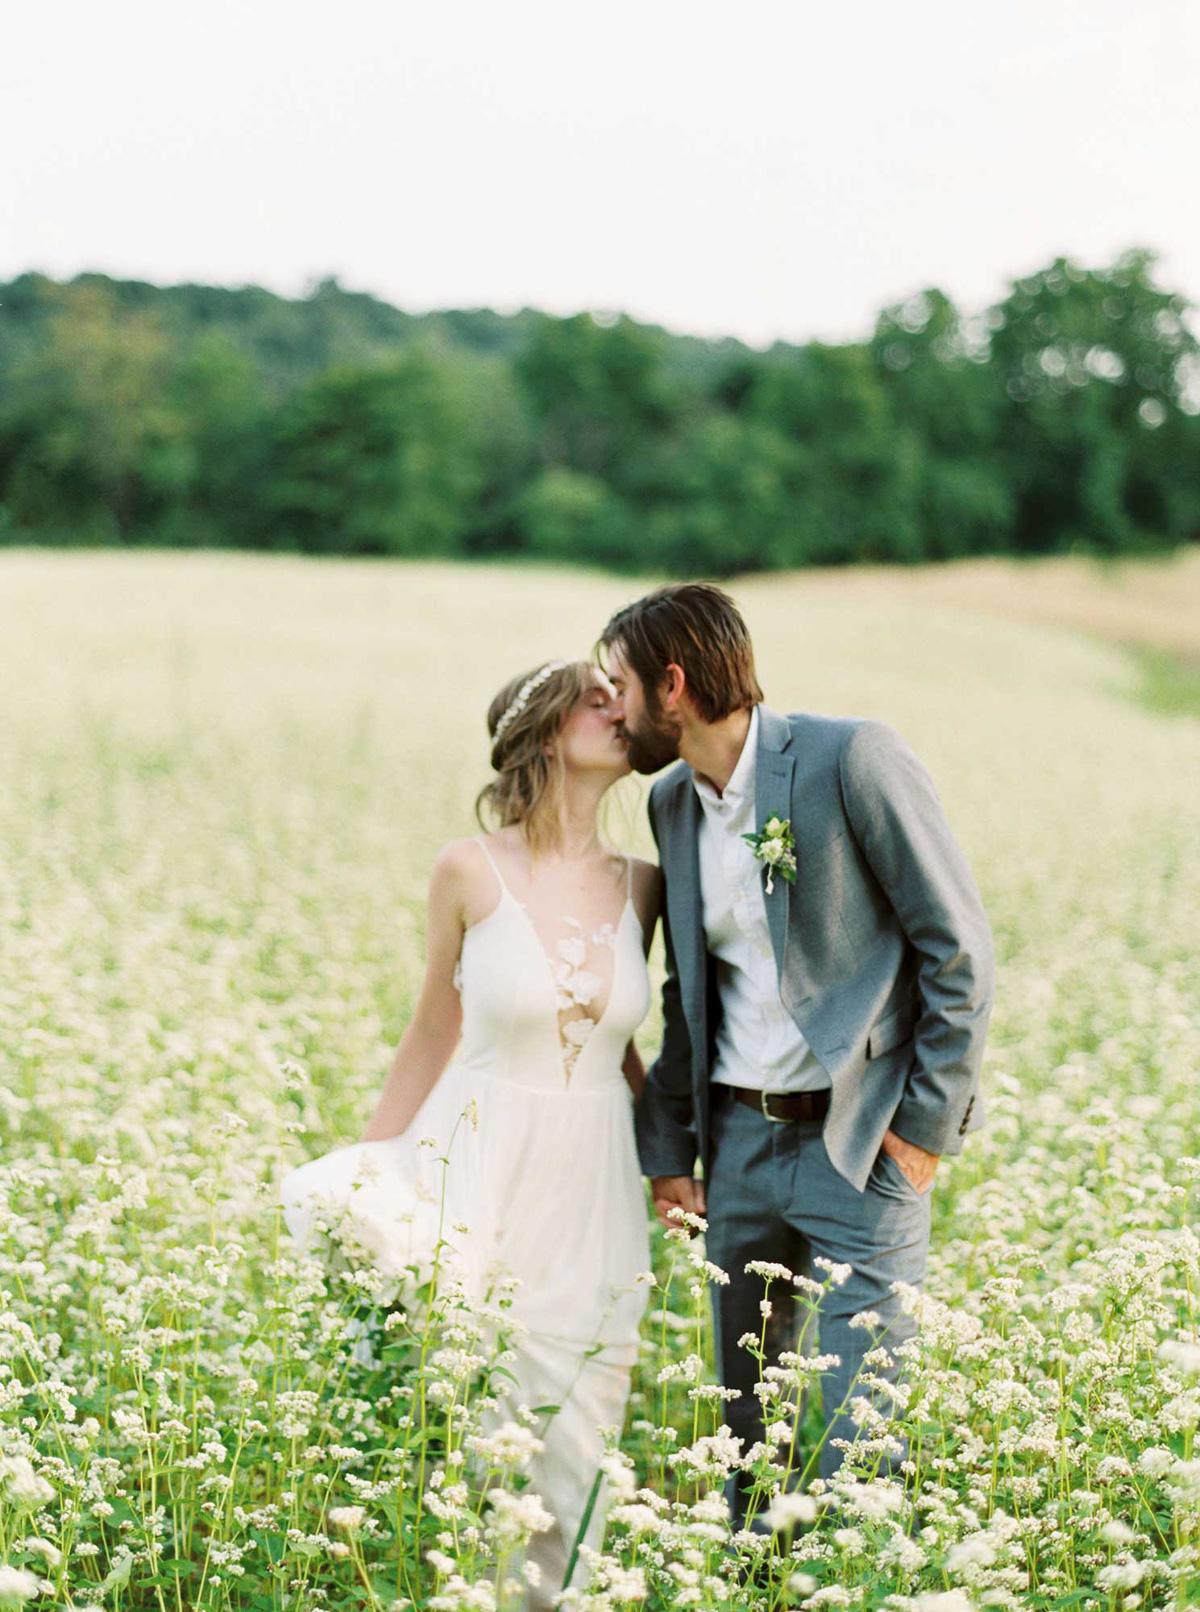 kayla-yestal-vineyard-bride-swish-list-woodland-weddings-niagara-wedding-editorial-39.jpg